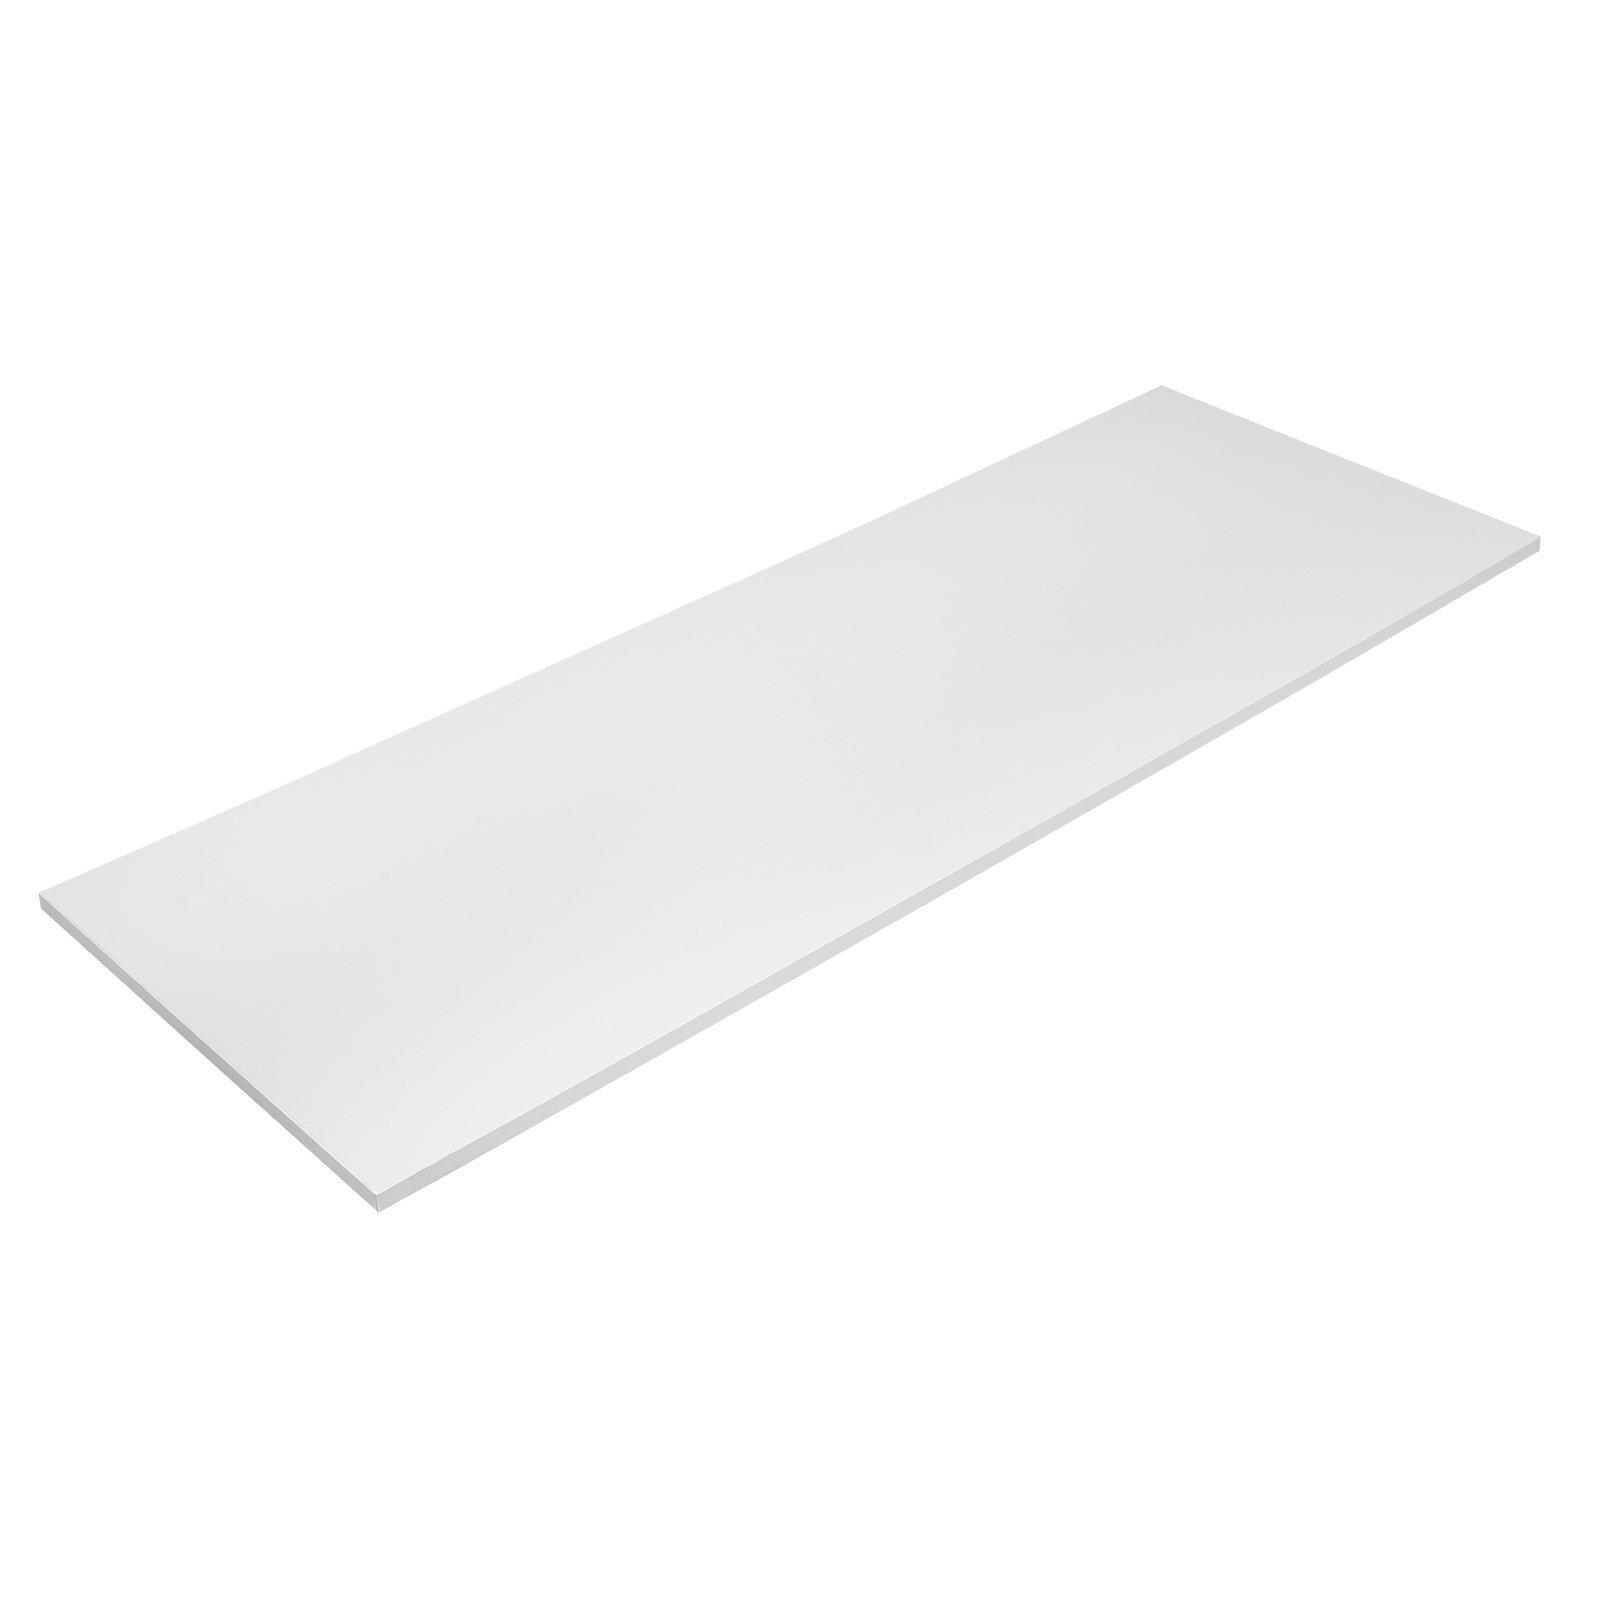 Flexi Storage Home Solutions 1196 x 16 x 430mm White Shelf